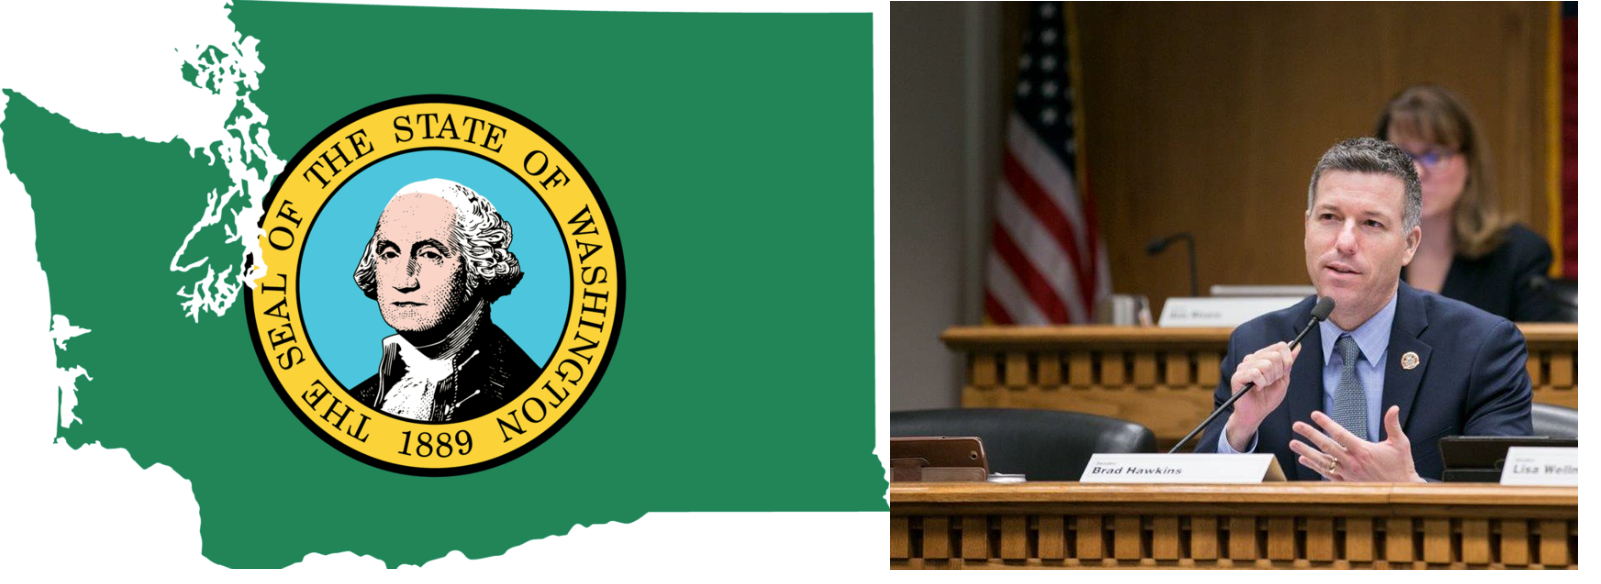 State of Washington Hydrogen